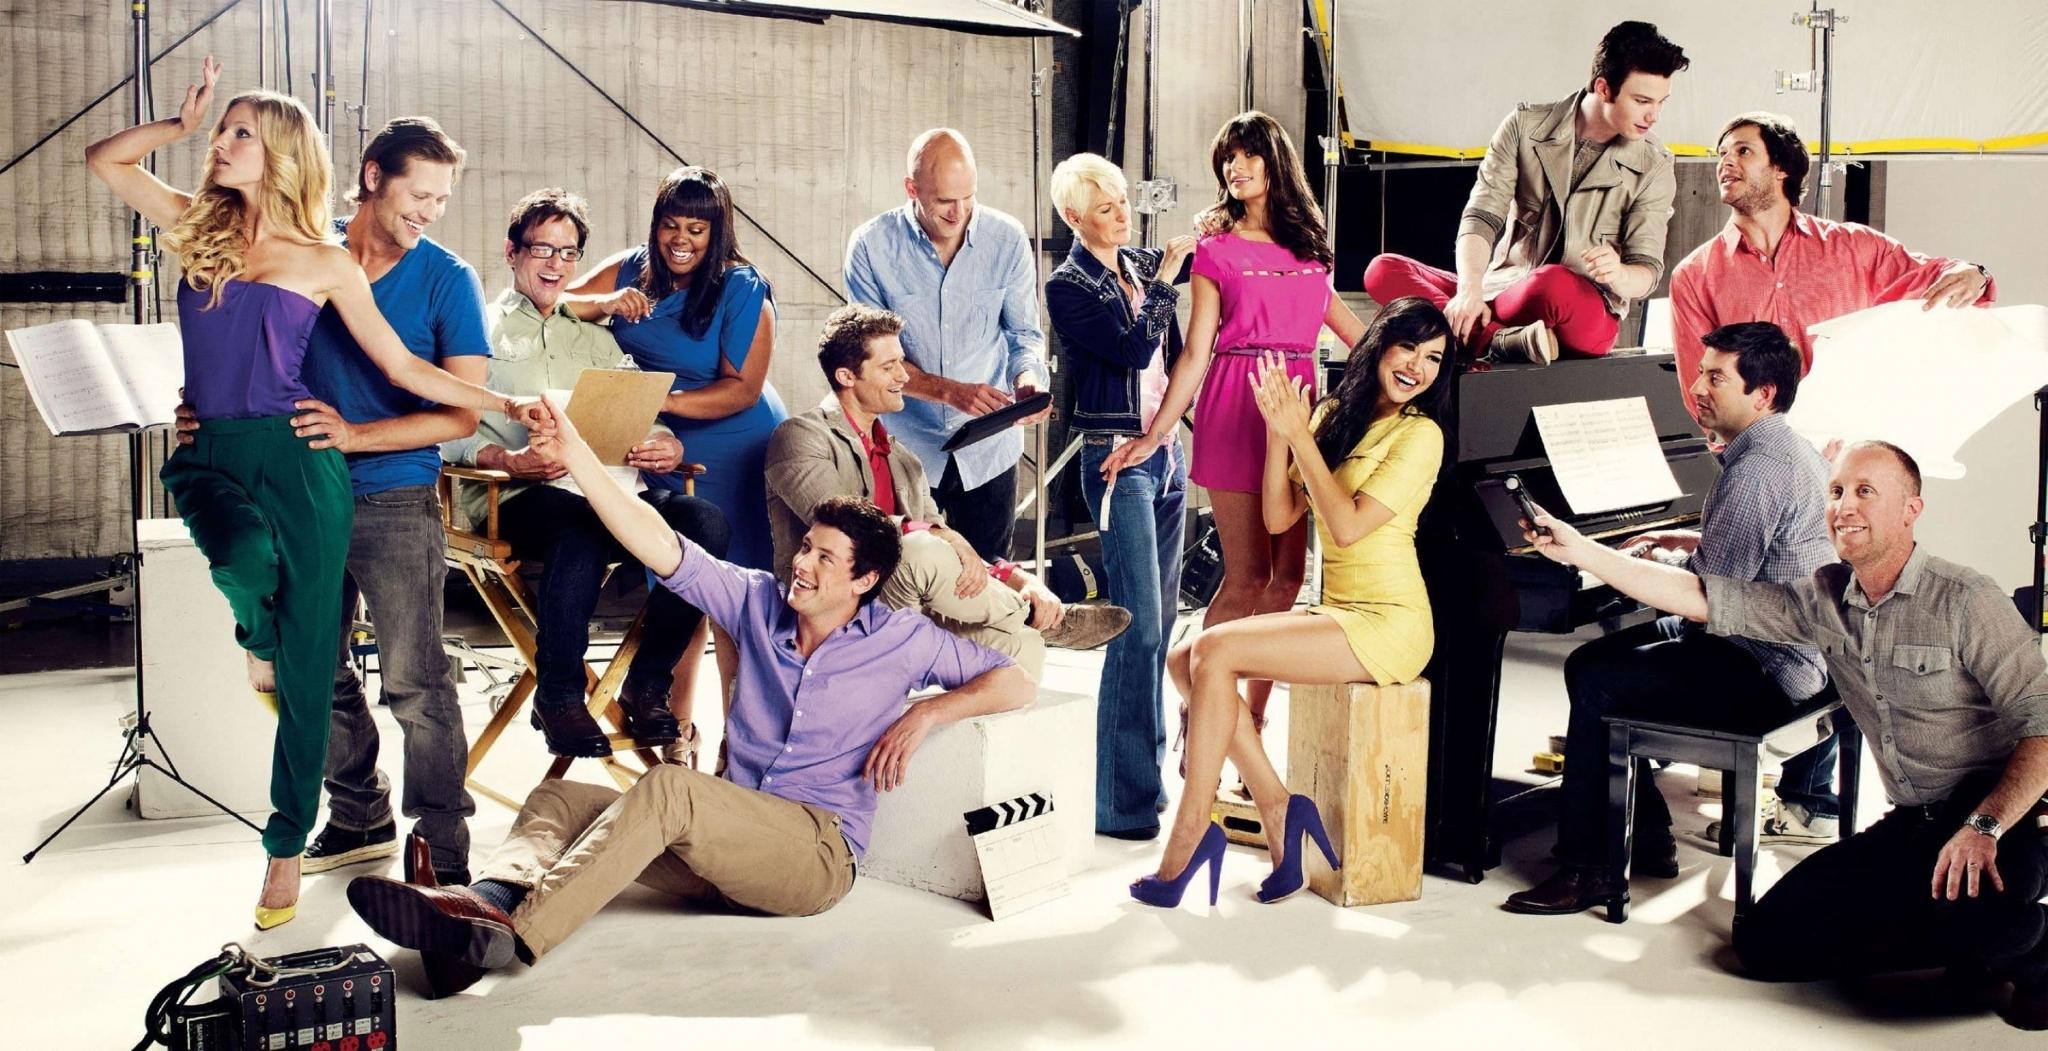 Felsebiyat Dergisi – Popular Skins Season 3 Episode 5 Cast